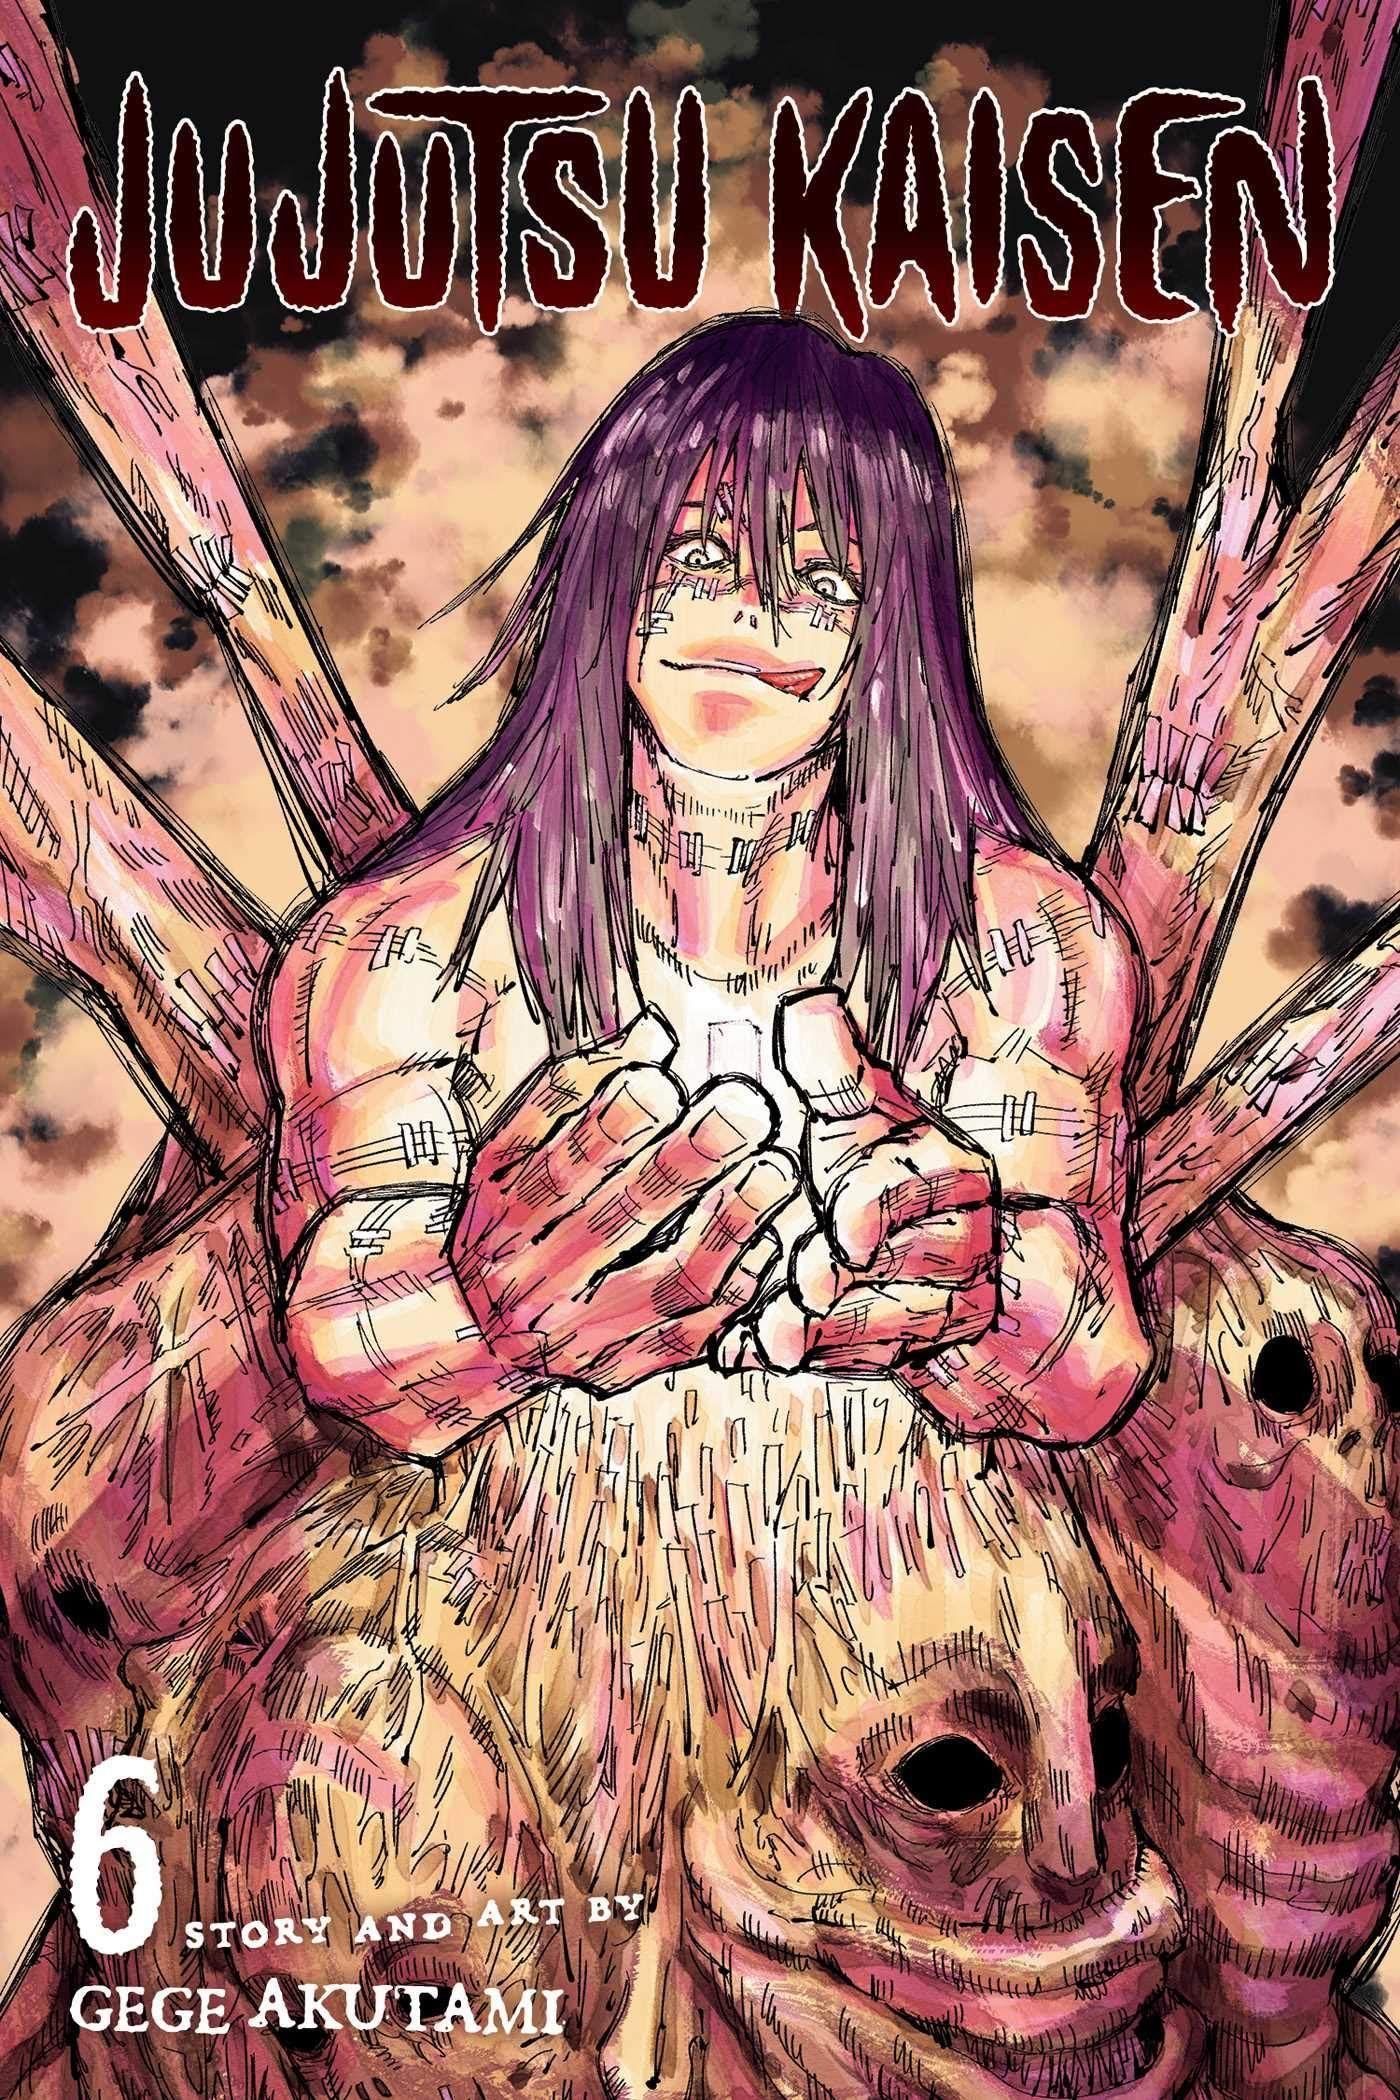 Best Up And Coming Manga Jujutsu Kaisen 6 Jujutsu Manga Covers Comics